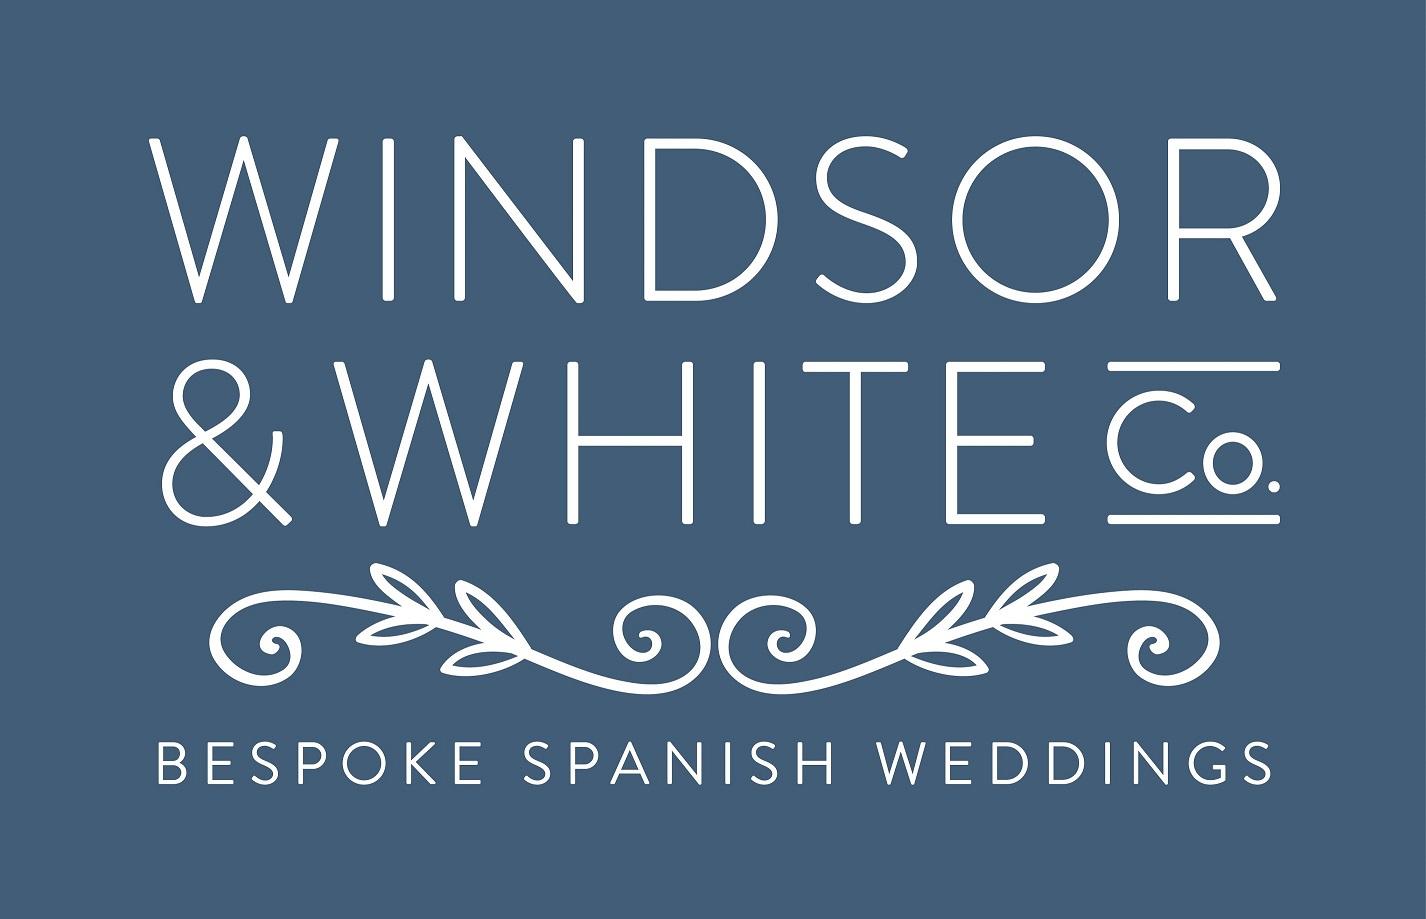 Windsor & White (Costa Blanca Wedding Services Ltd)